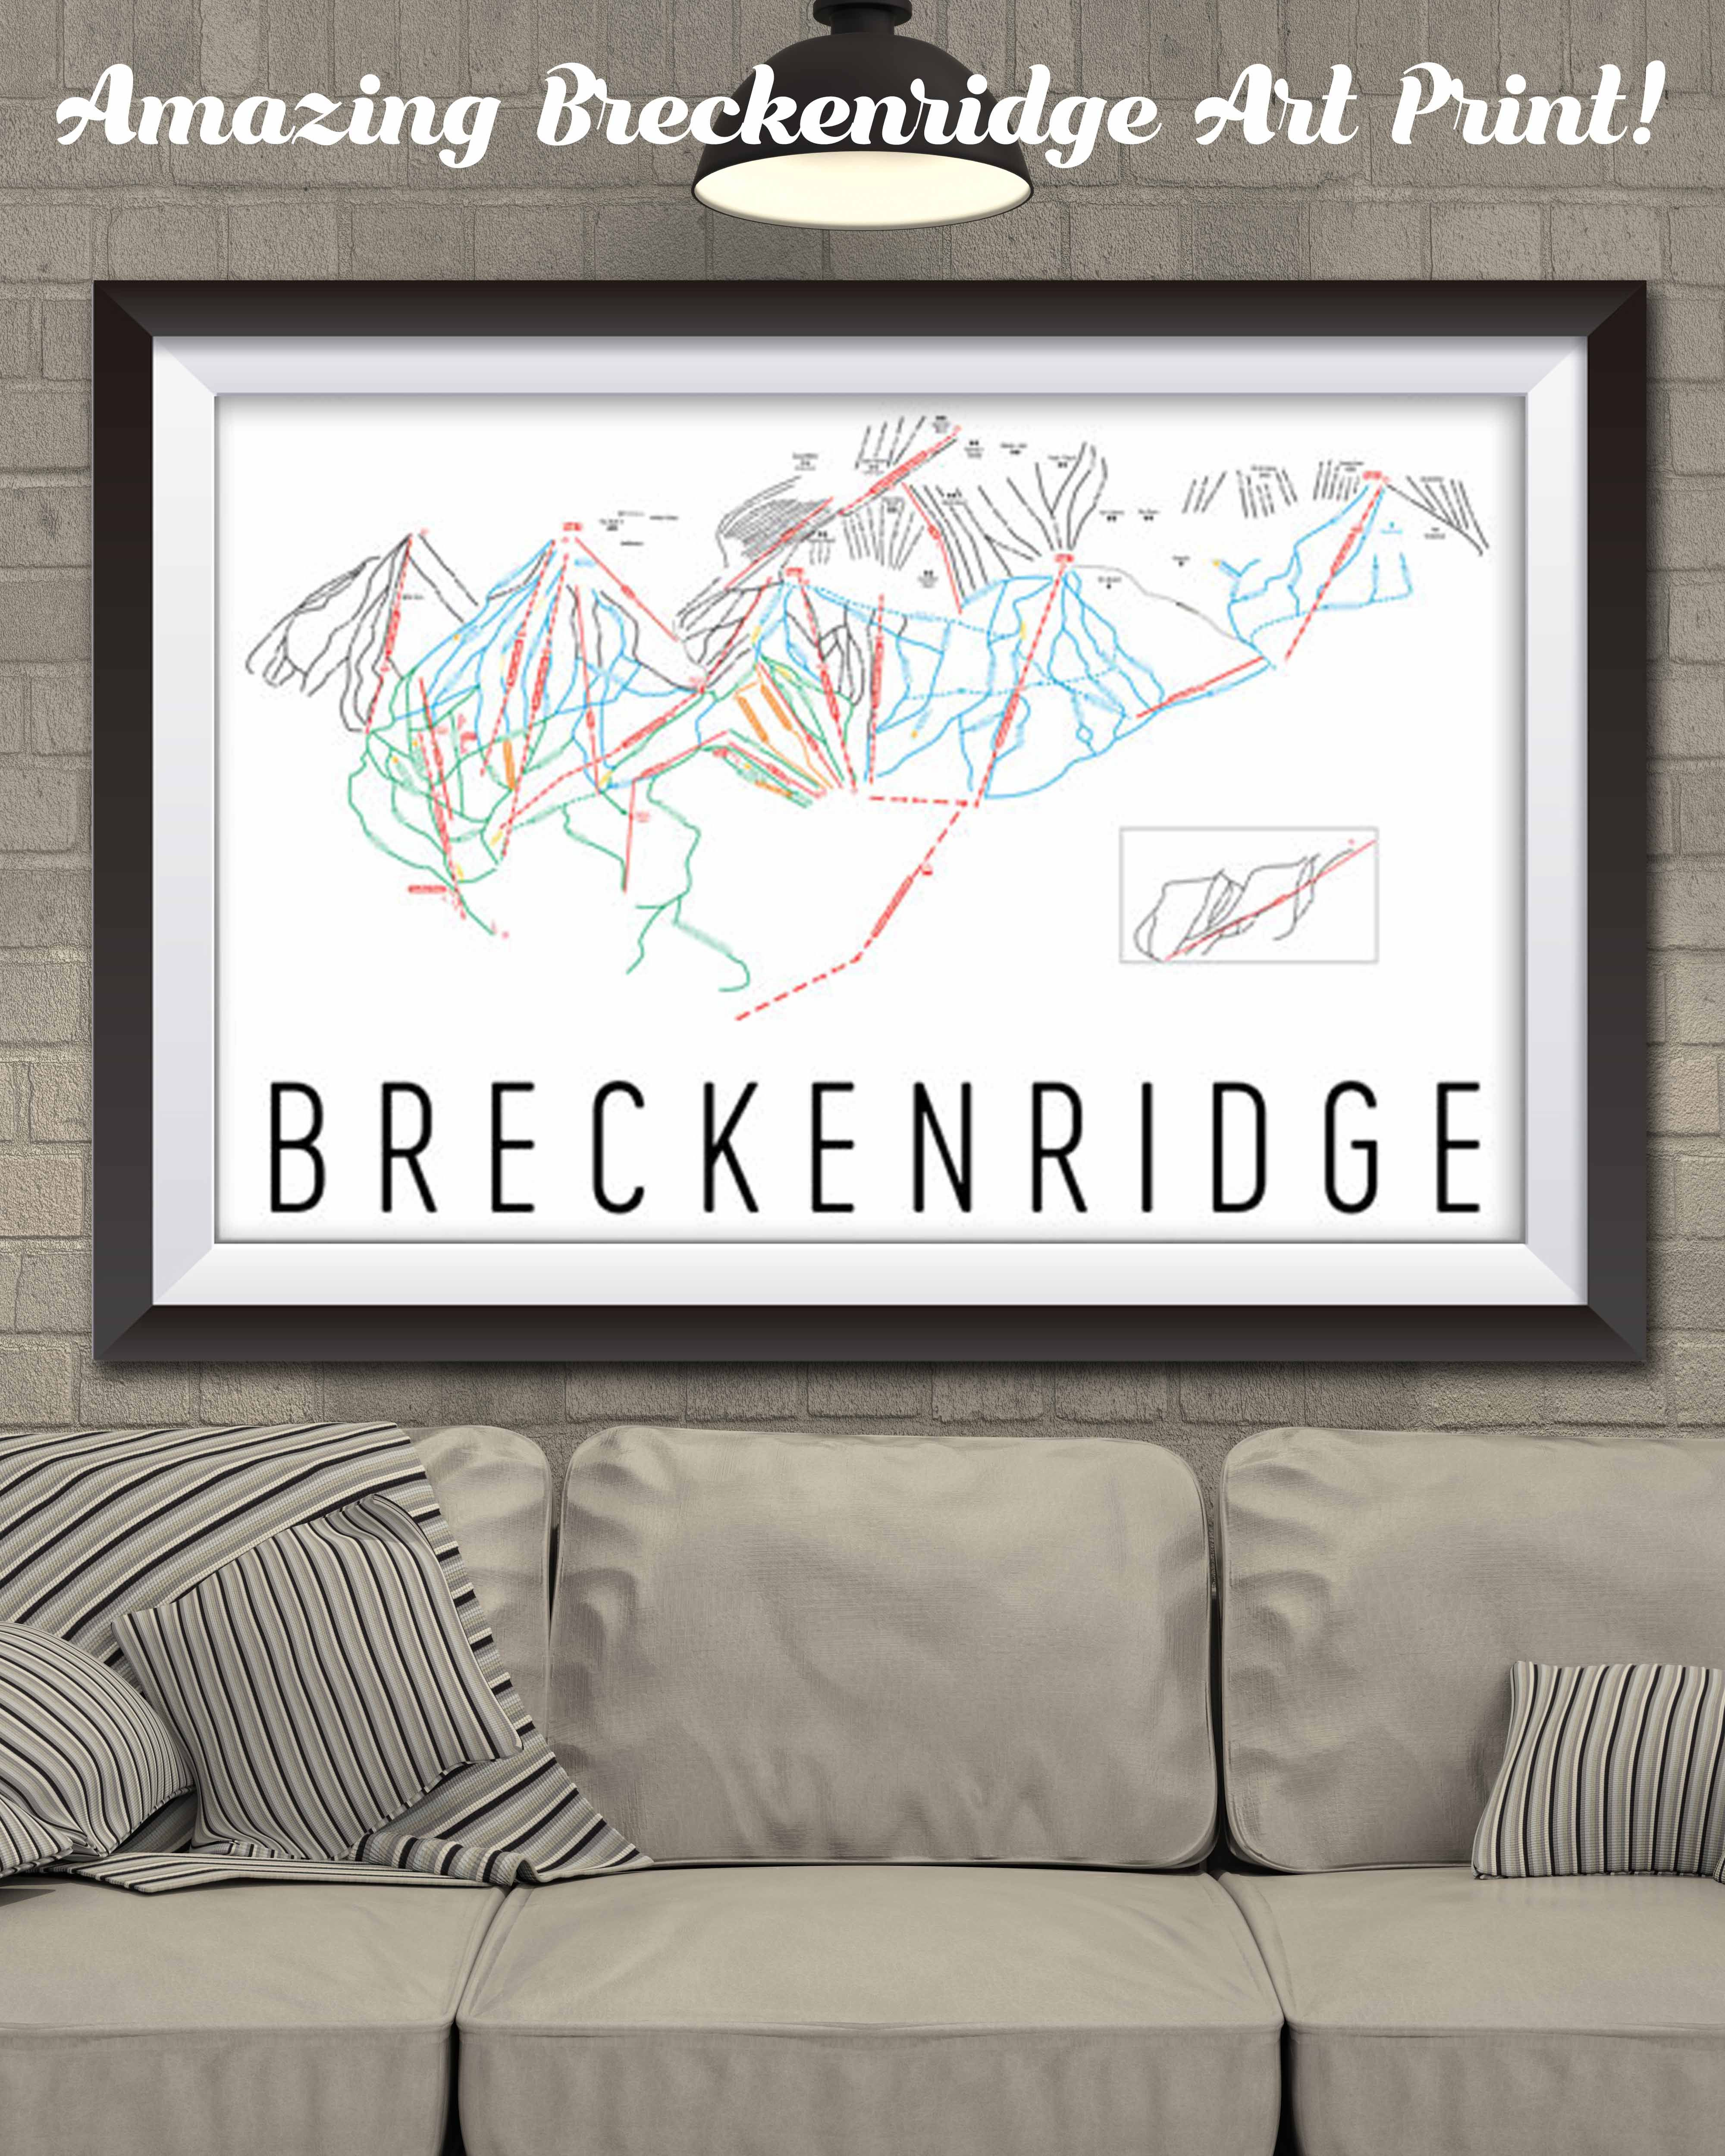 Breckenridge Ski Map Art, Breckenridge Colorado, Breckenridge Trail on map of all colorado golf courses, map of all colorado counties, map of buttermilk ski area, map of all colorado cities and towns, map of beaver creek ski resort trail,